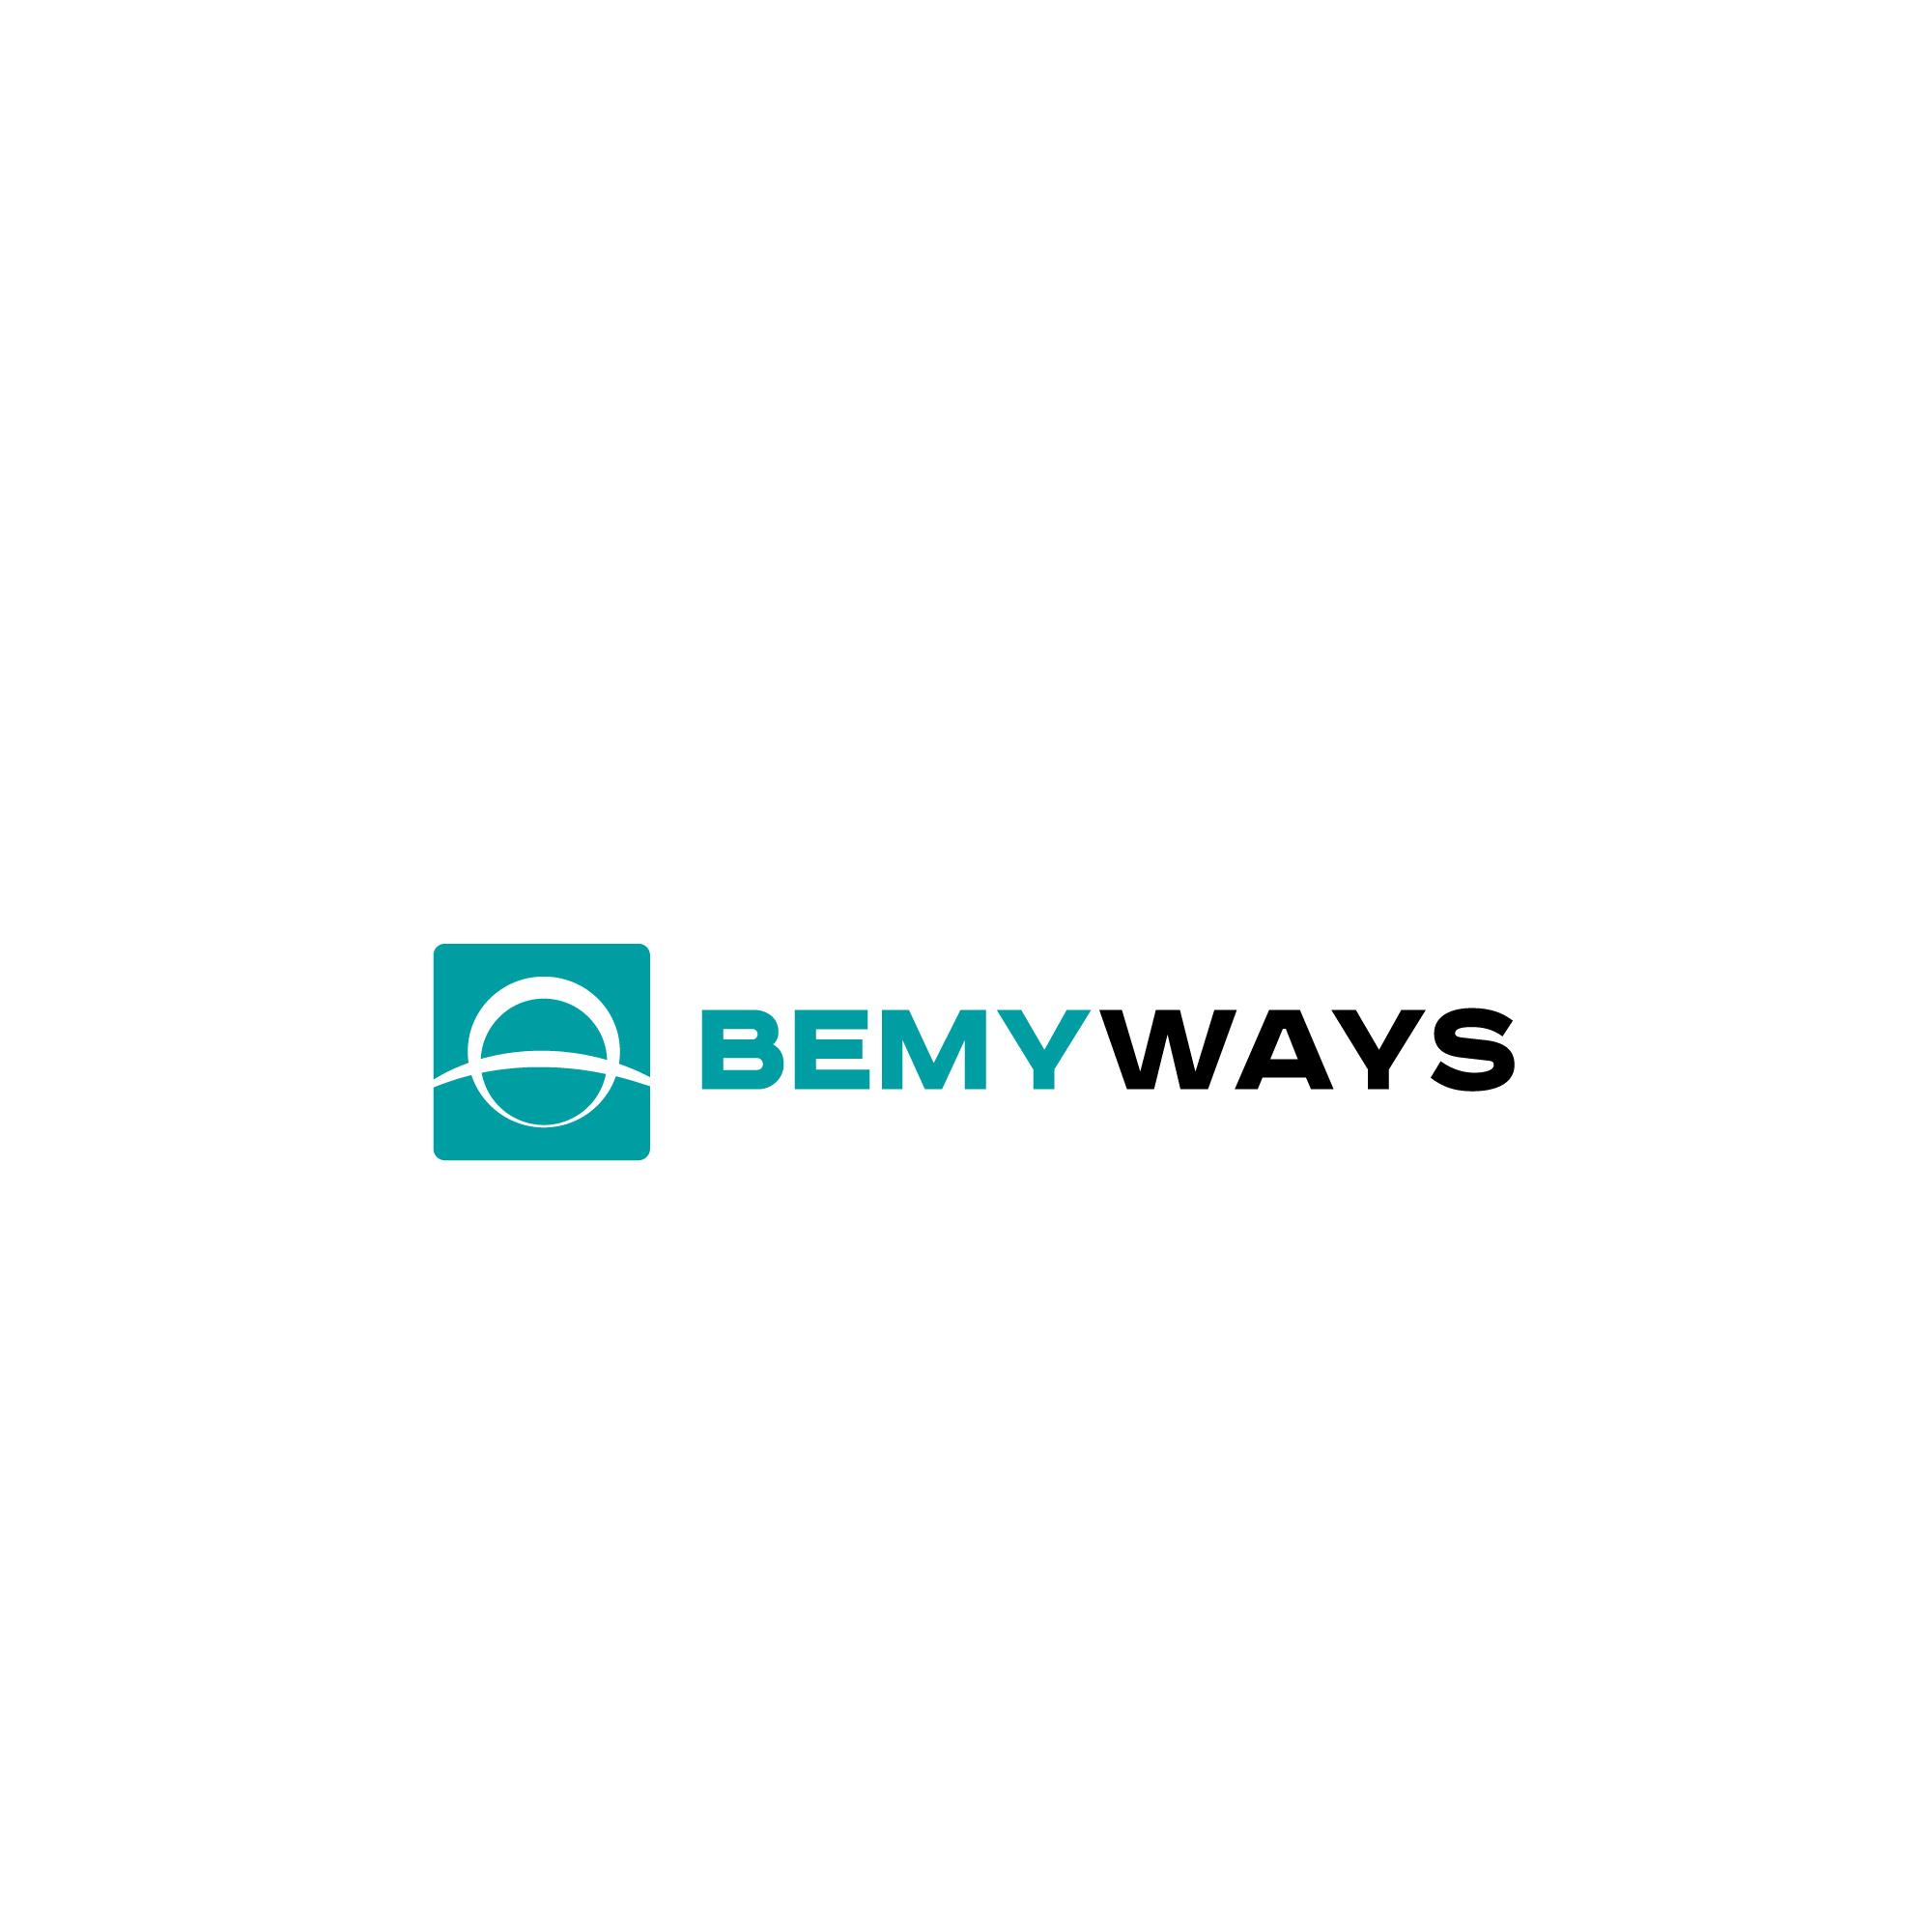 Разработка логотипа и иконки для Travel Video Platform фото f_4025c377e43d54ce.jpg